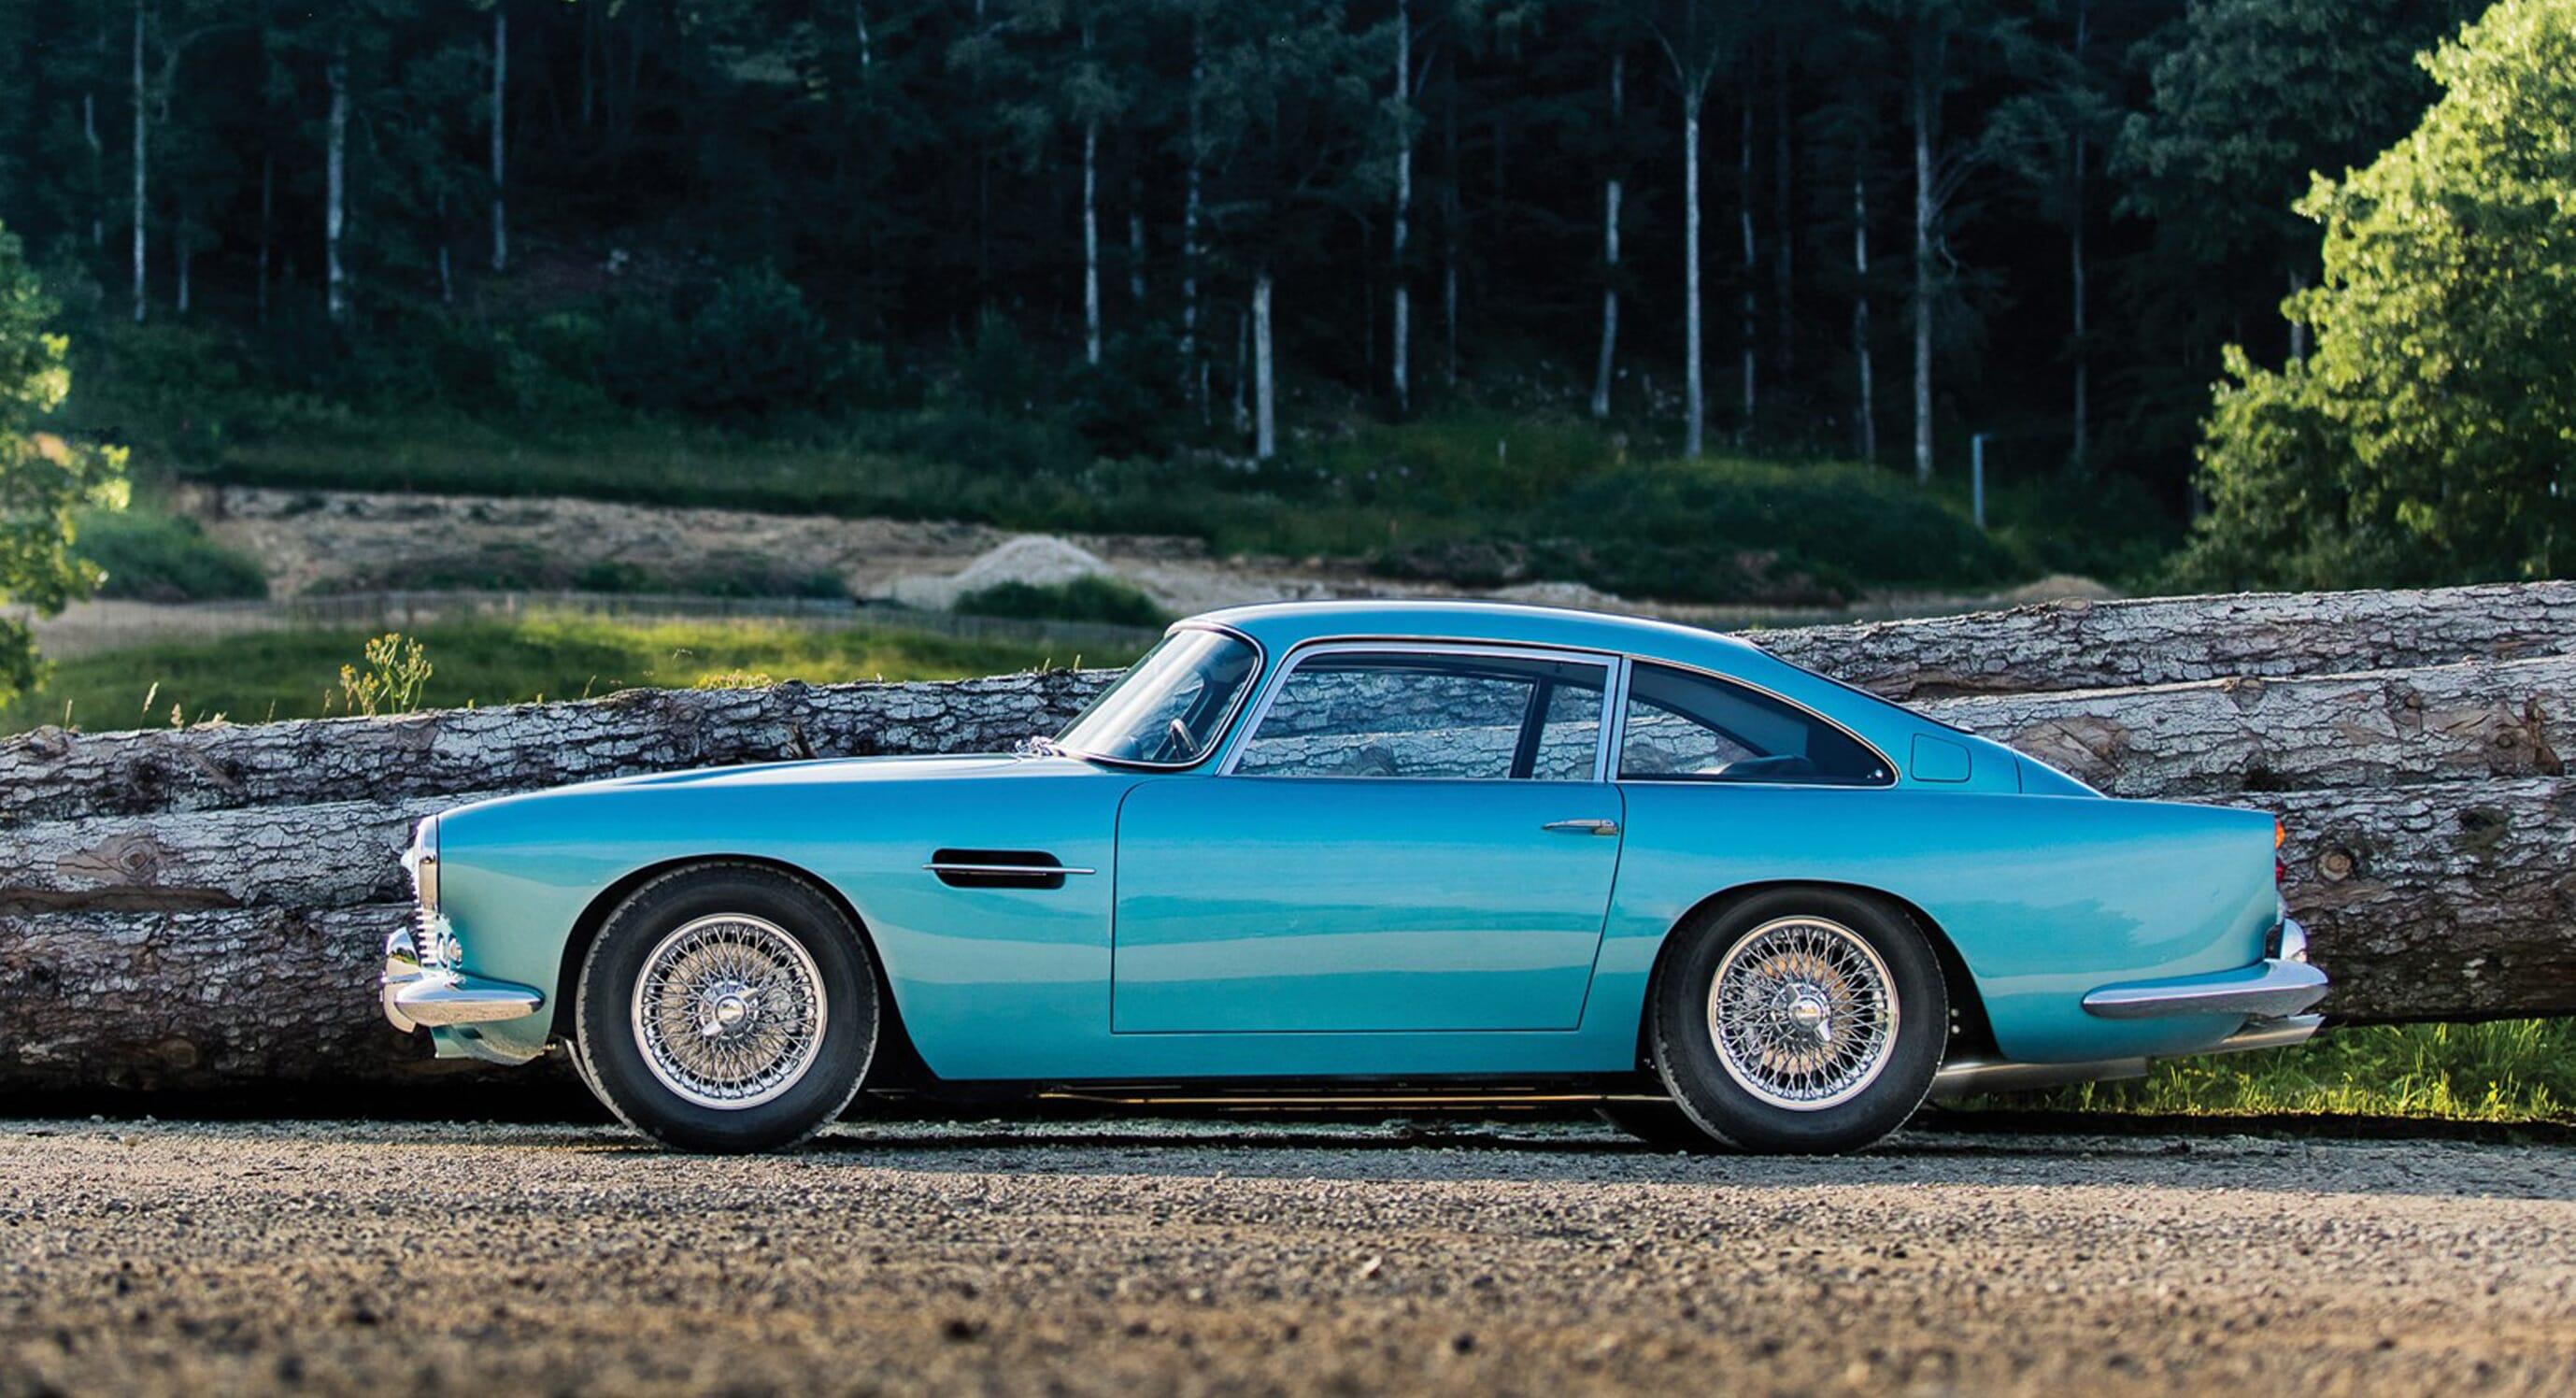 This 1962 Aston Martin DB4 'SS Engine' Series IV Still Shines